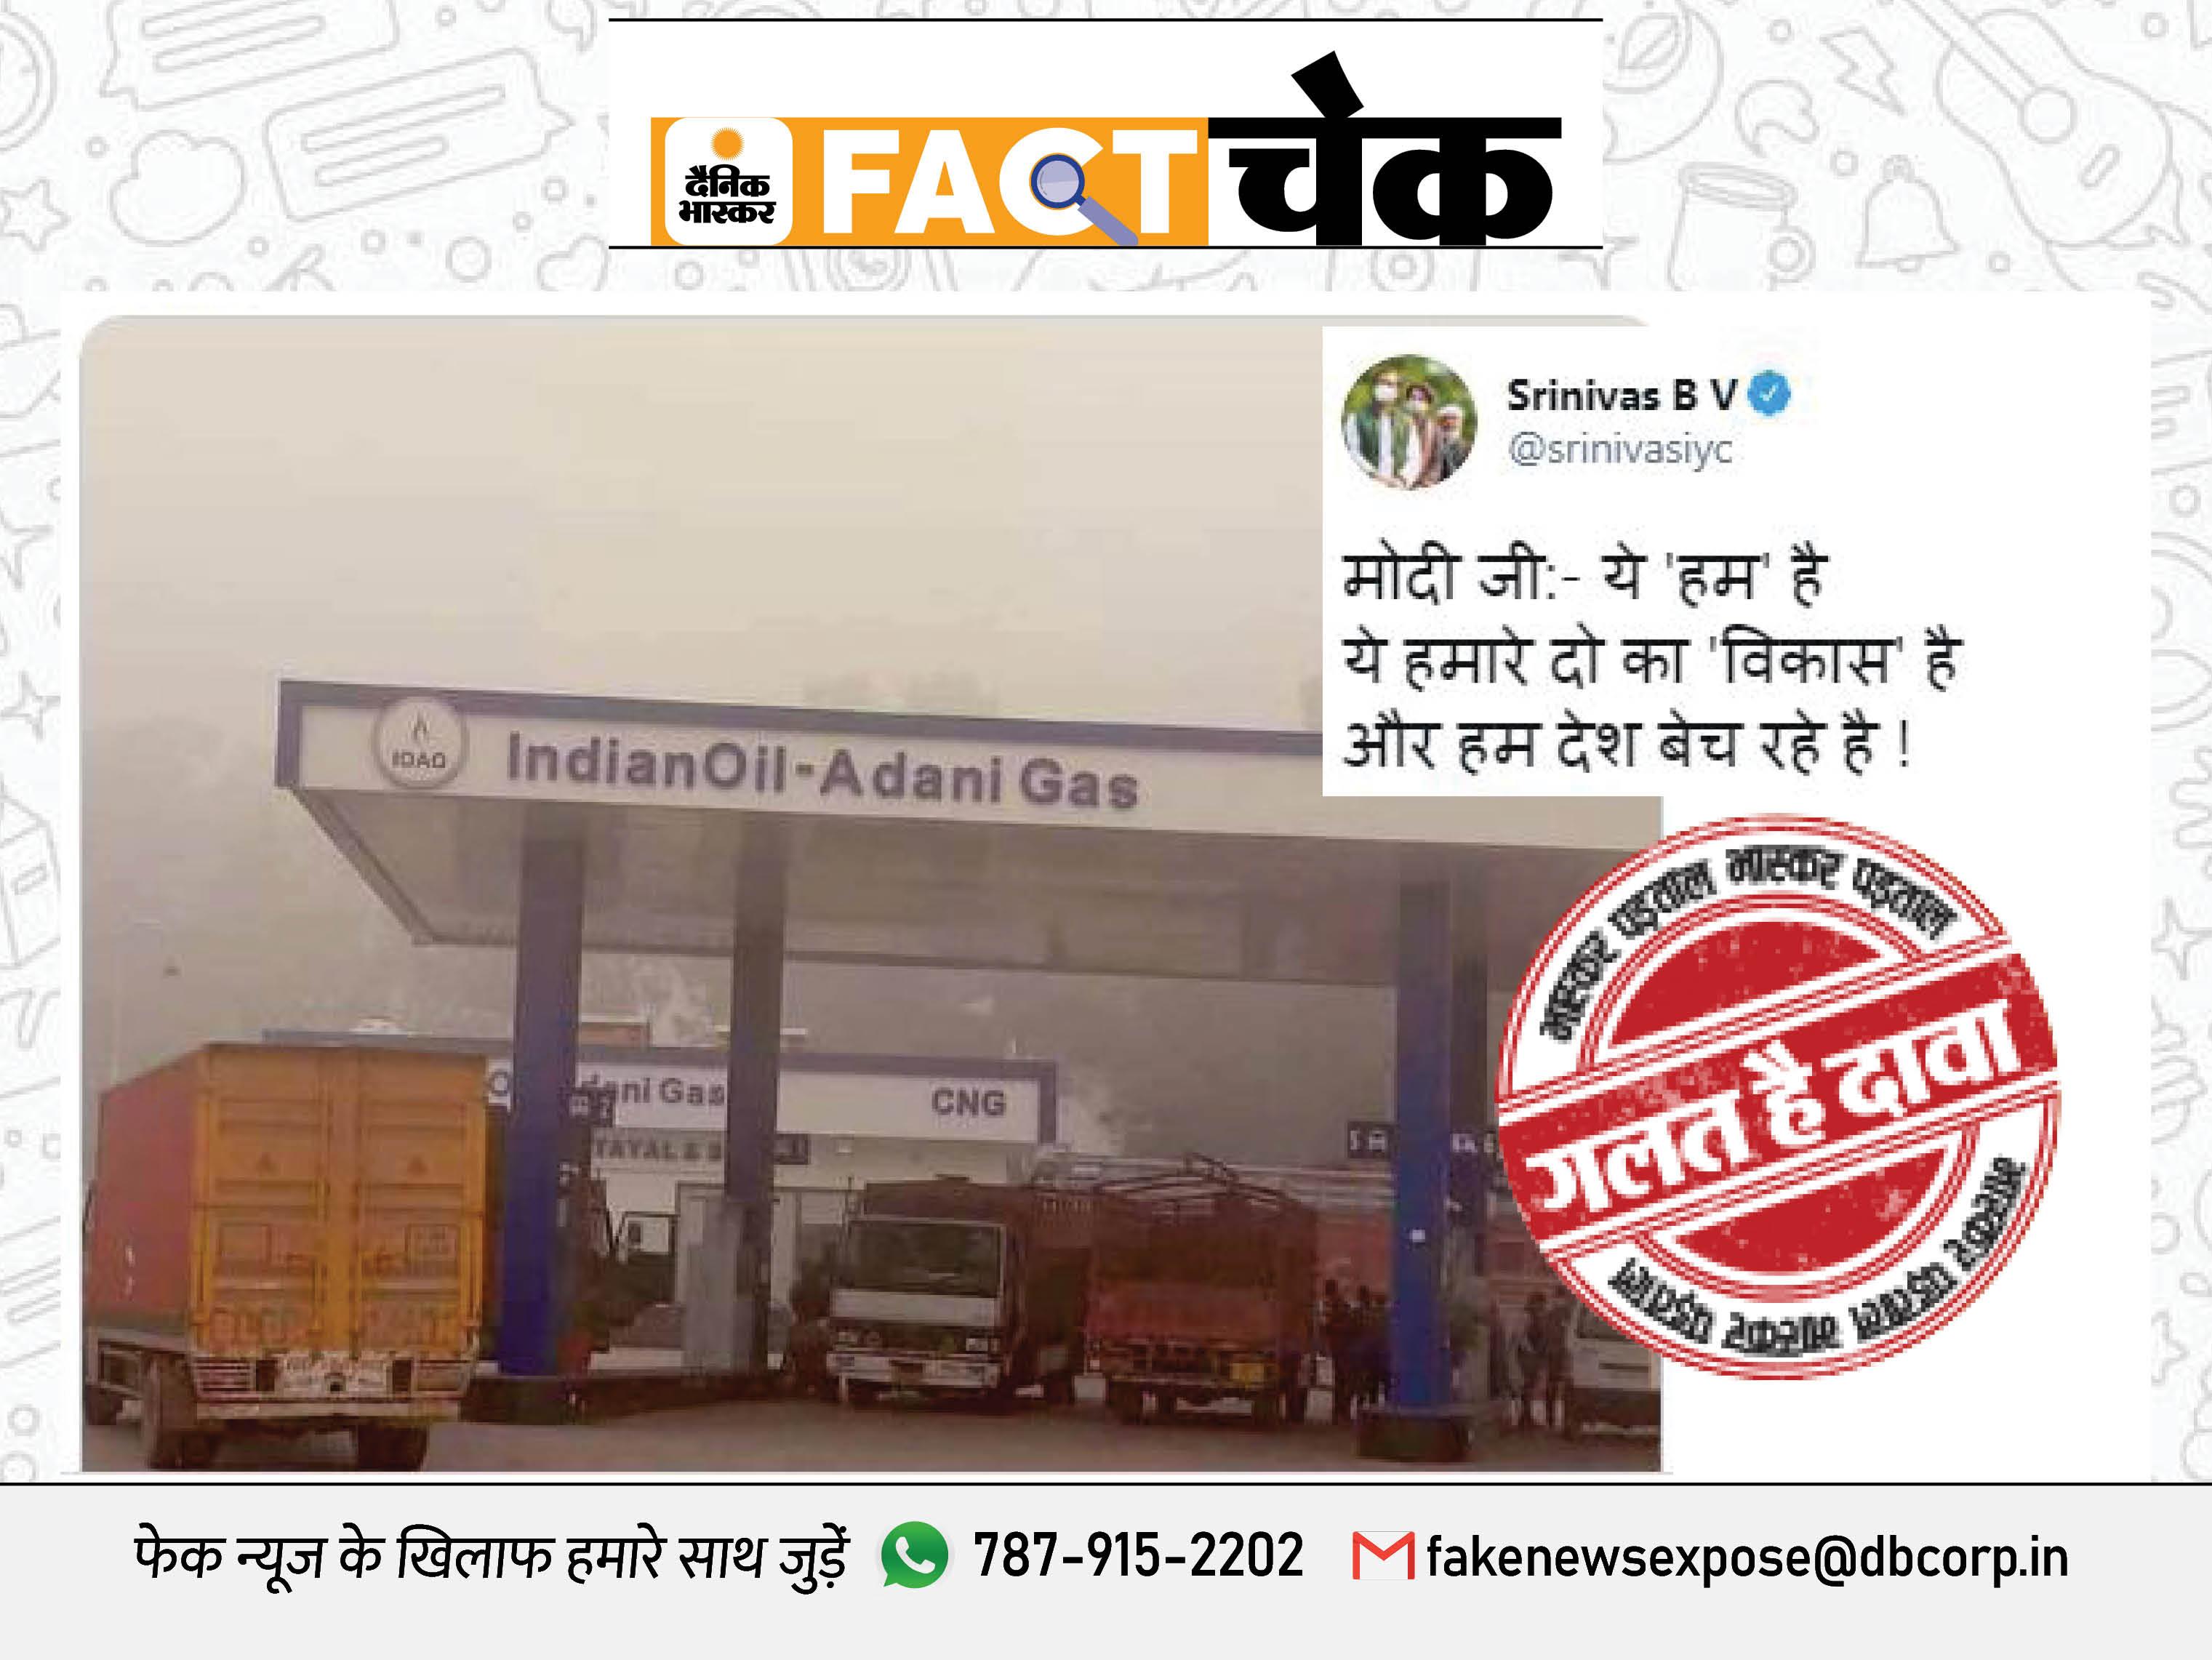 मोदी सरकार ने अडानीग्रुप को बेचा इंडियन ऑयल? जानिएइस दावे की सच्चाई|फेक न्यूज़ एक्सपोज़,Fake News Expose - Dainik Bhaskar